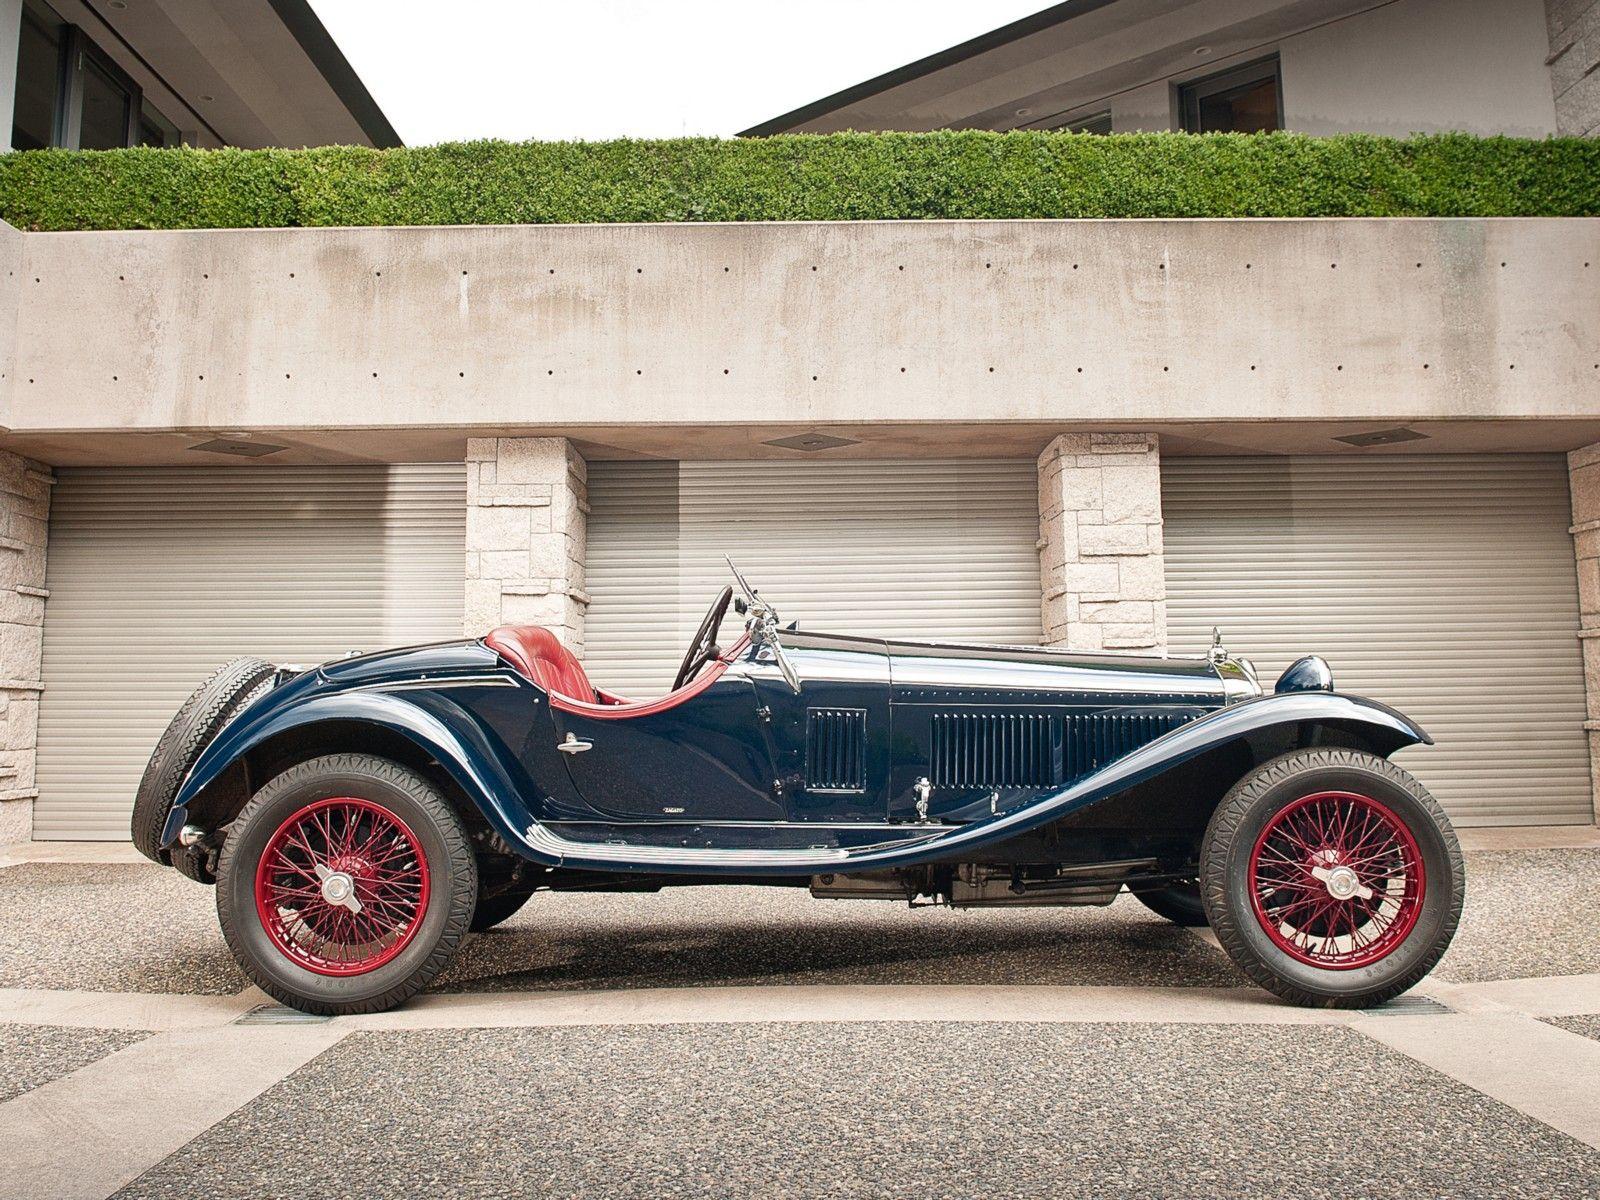 1930 Alfa Romeo 6C 1750 GS ✏✏✏✏✏✏✏✏✏✏✏✏✏✏✏✏ AUTRES VEHICULES - OTHER VEHICLES ☞ https://fr.pinterest.com/barbierjeanf/pin-index-voitures-v%C3%A9hicules/ ══════════════════════ BIJOUX ☞ https://www.facebook.com/media/set/?set=a.1351591571533839&type=1&l=bb0129771f ✏✏✏✏✏✏✏✏✏✏✏✏✏✏✏✏